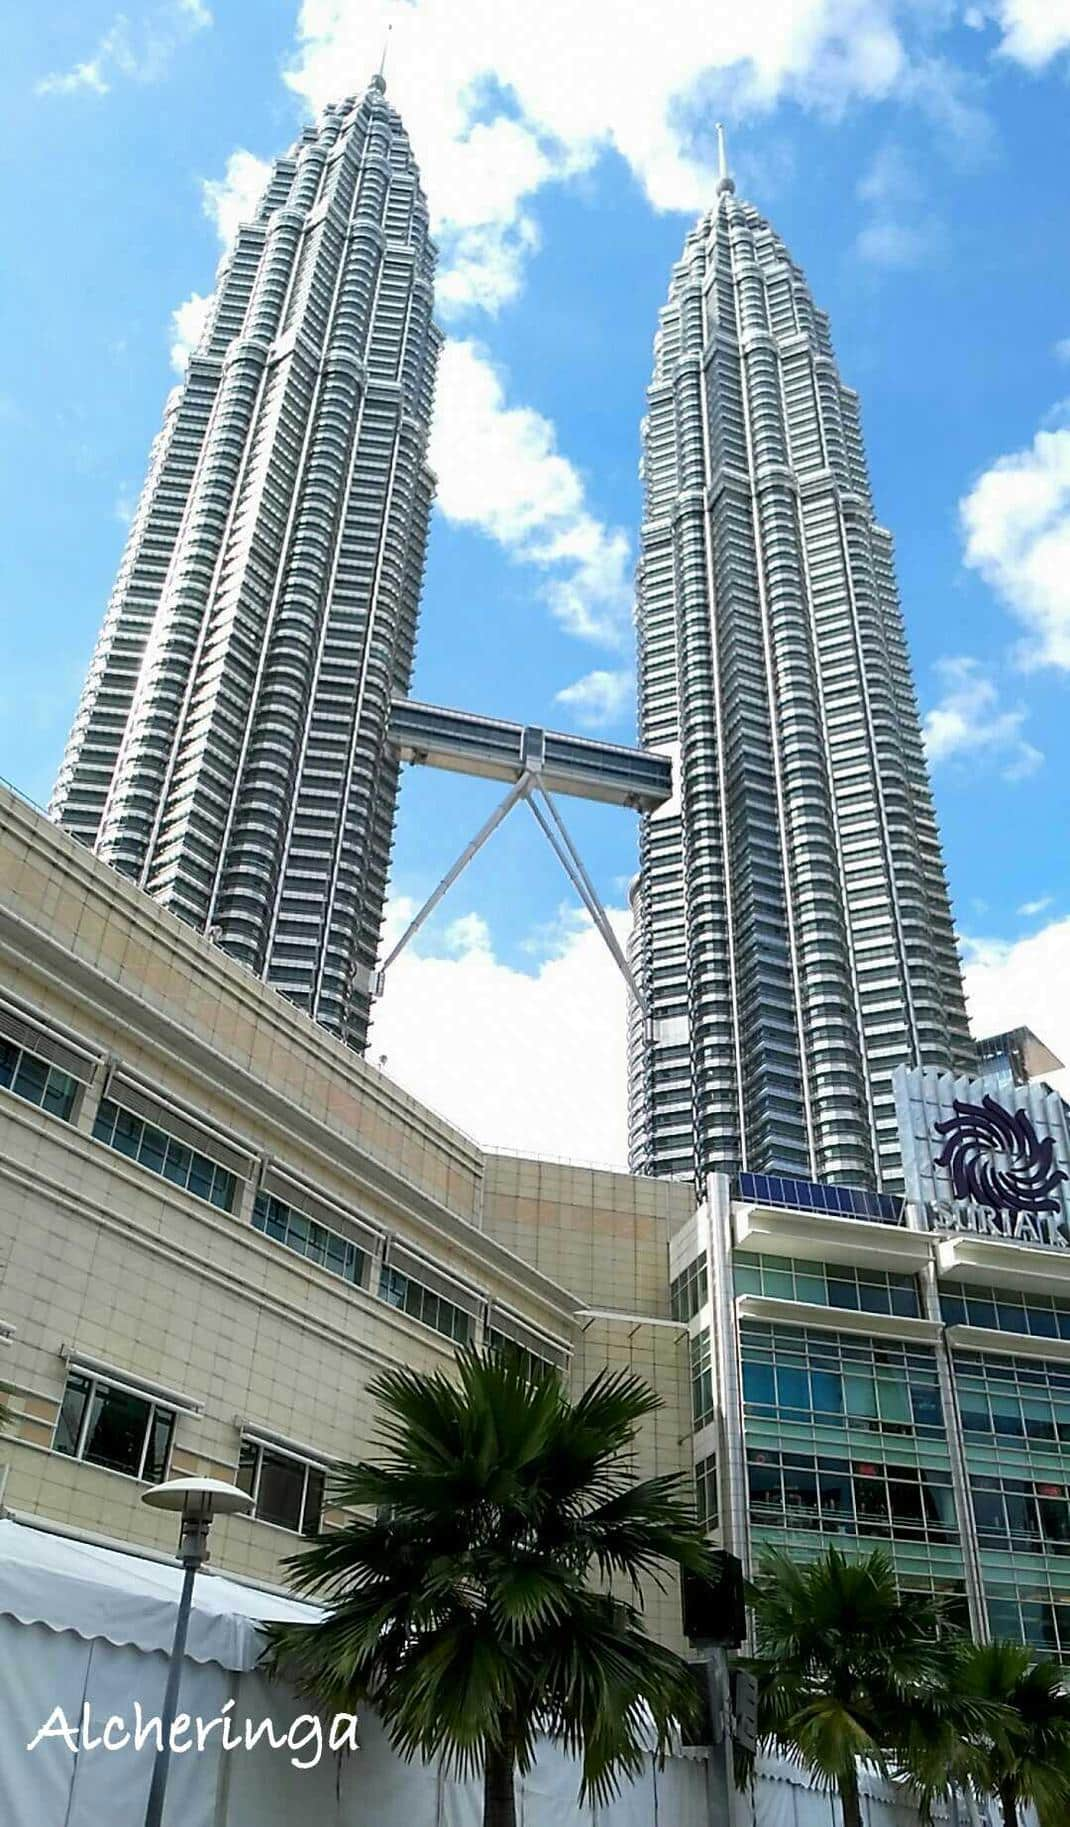 Les tours Petronas en Malaisie